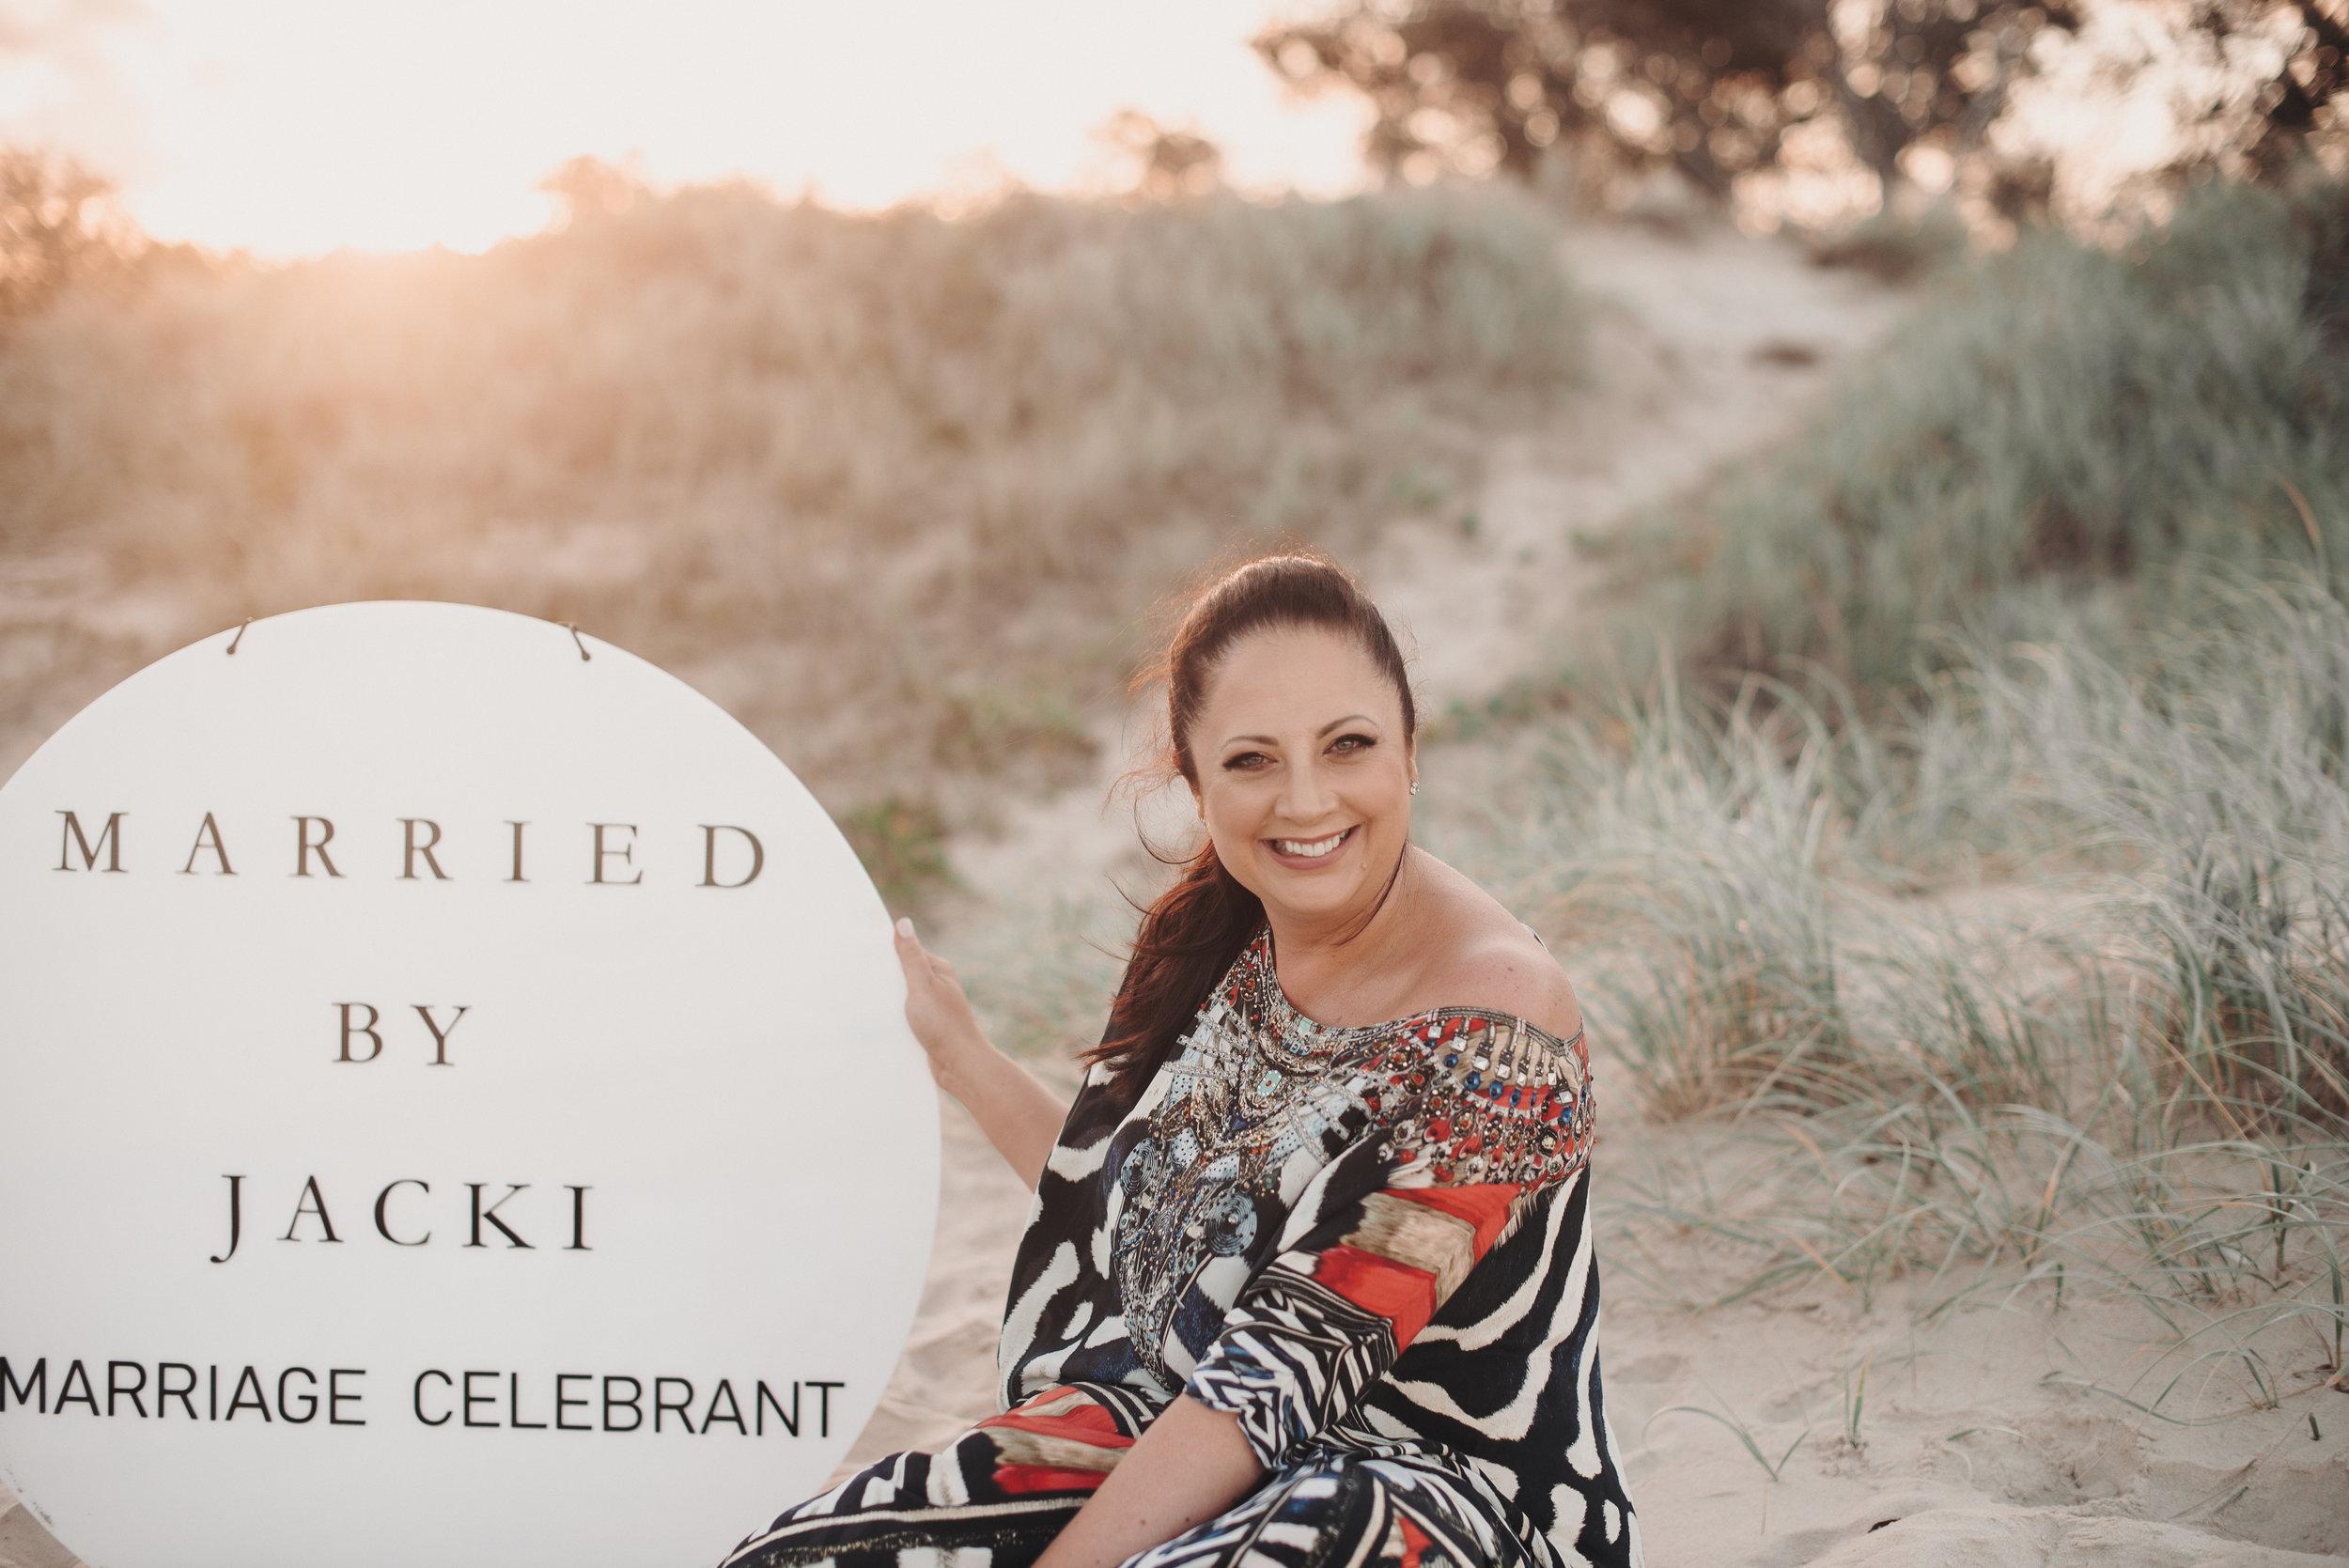 Married by Jacki